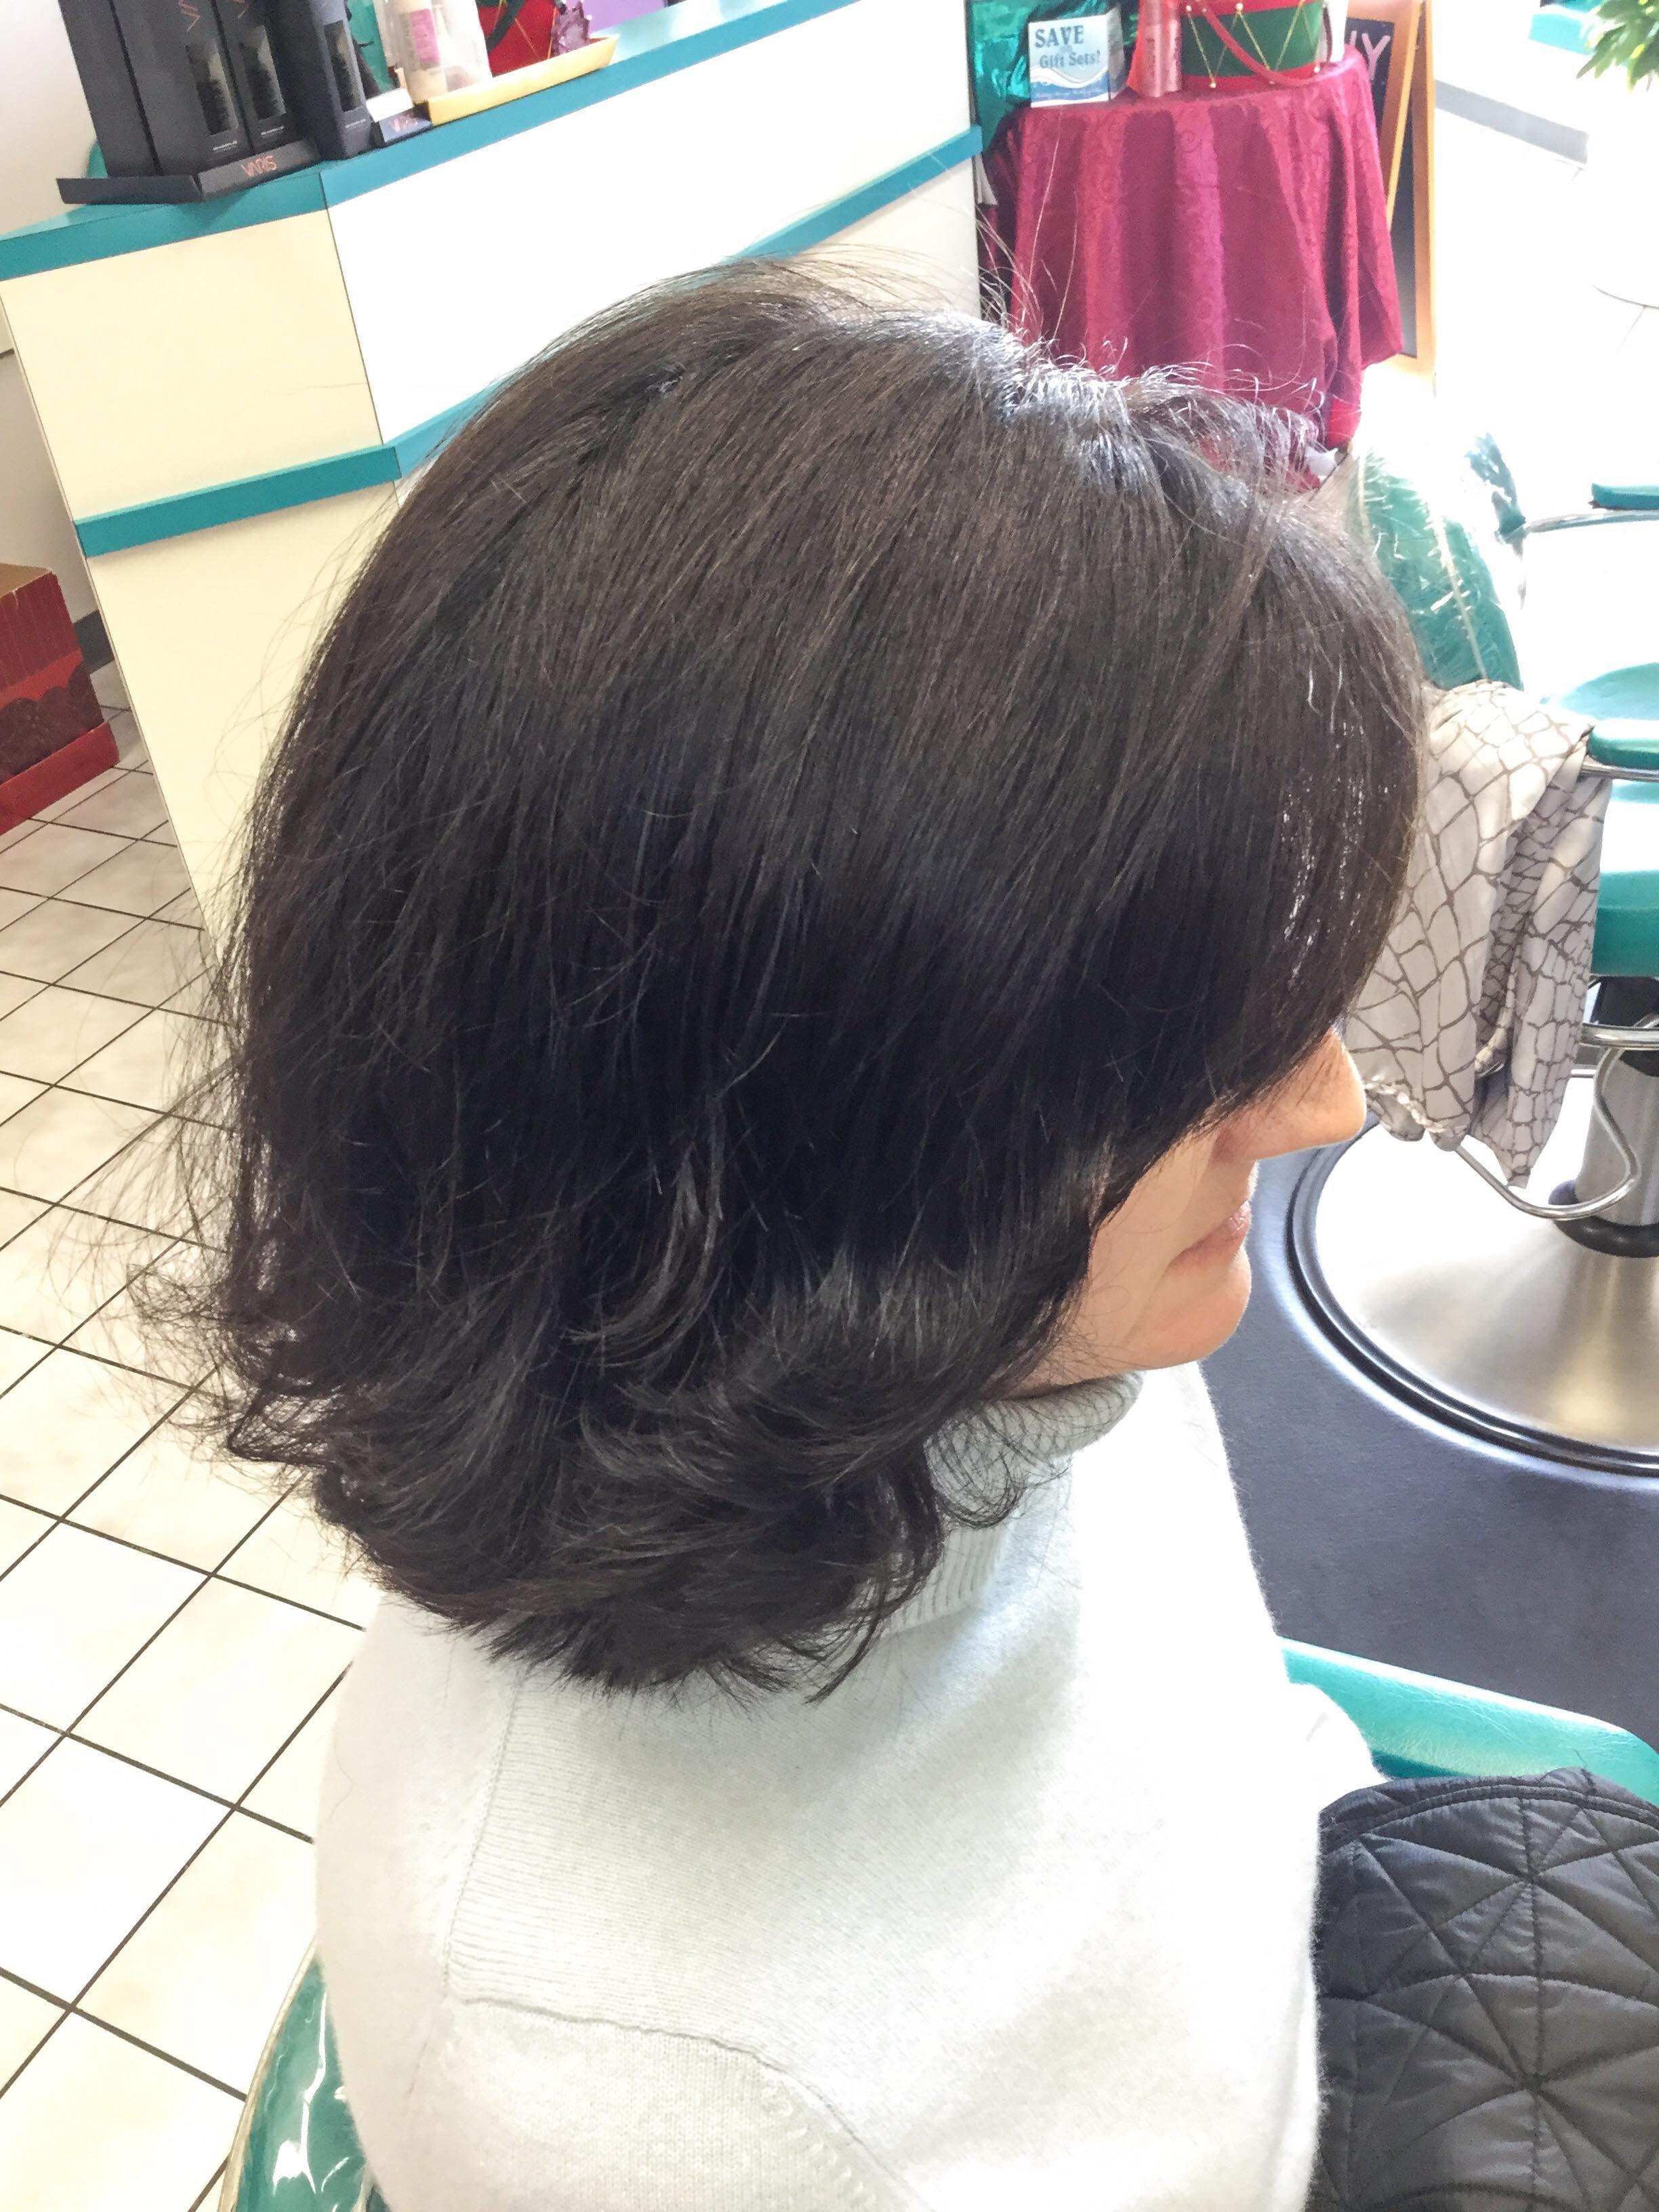 Hair #CTHair #Style #Haircut #Hairstylist #Haircolor #Hairstyles